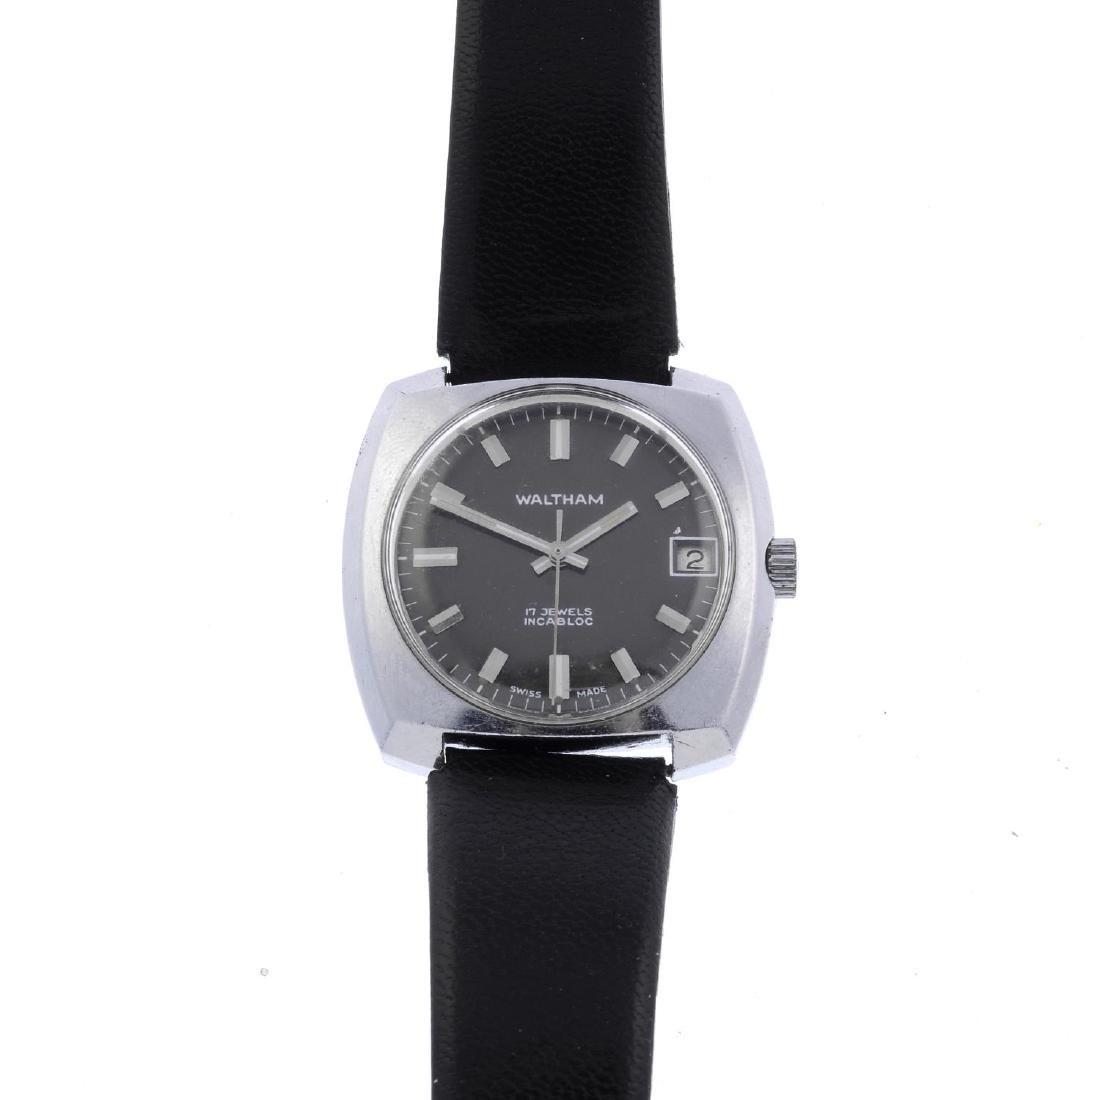 WALTHAM - a gentleman's wrist watch. Base metal case